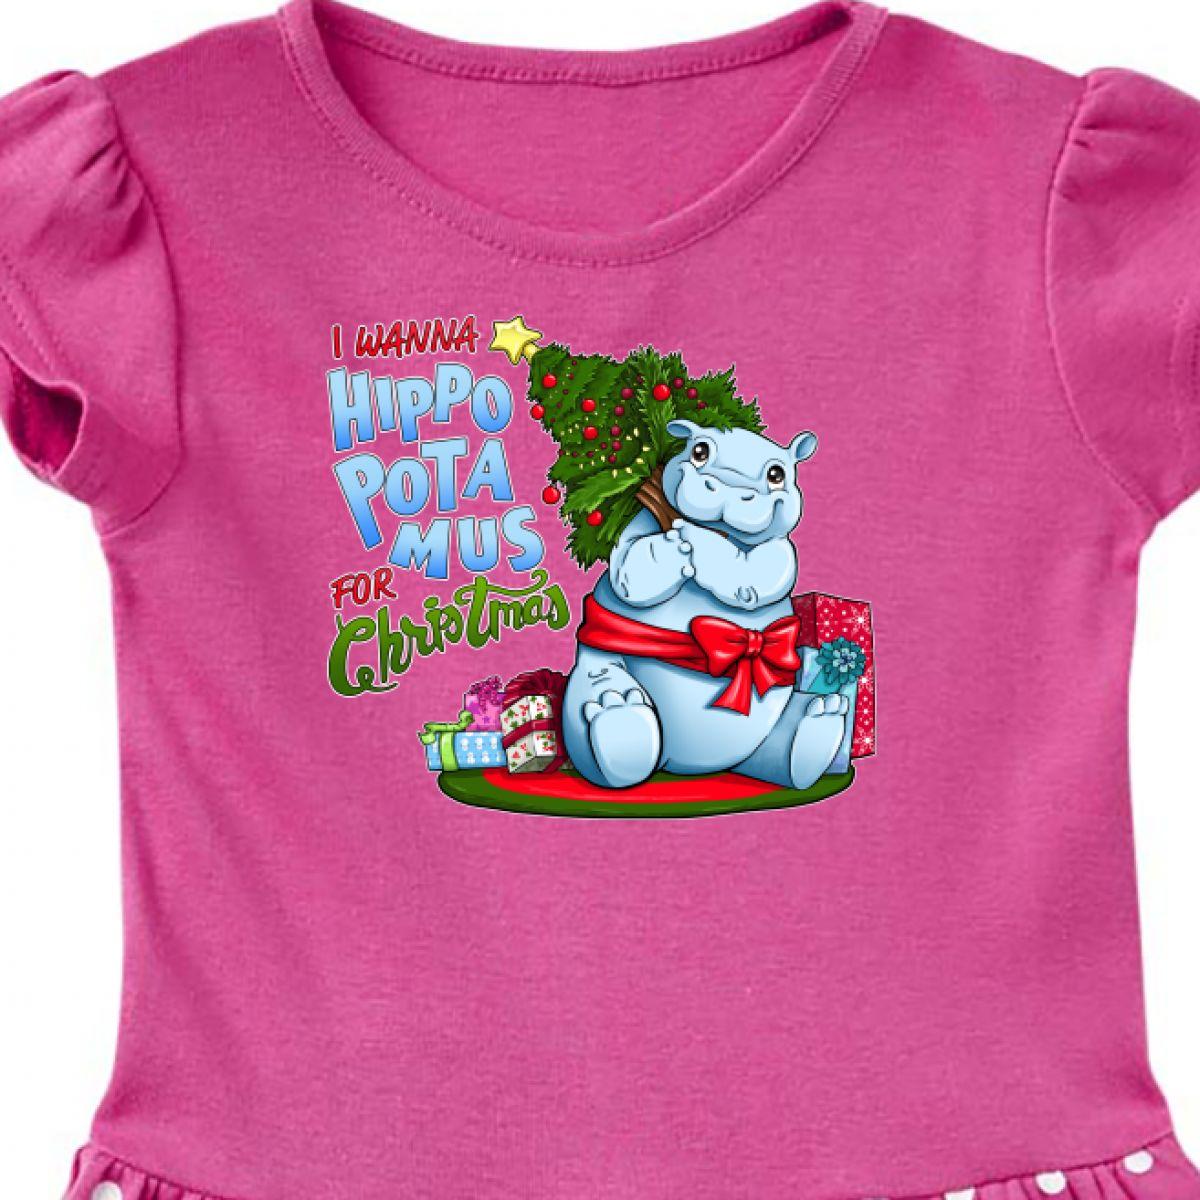 I Wanna Hippopotamus For Christmas.Details About Inktastic I Wanna Hippopotamus For Christmas Cute Hippo Toddler Dress Holiday